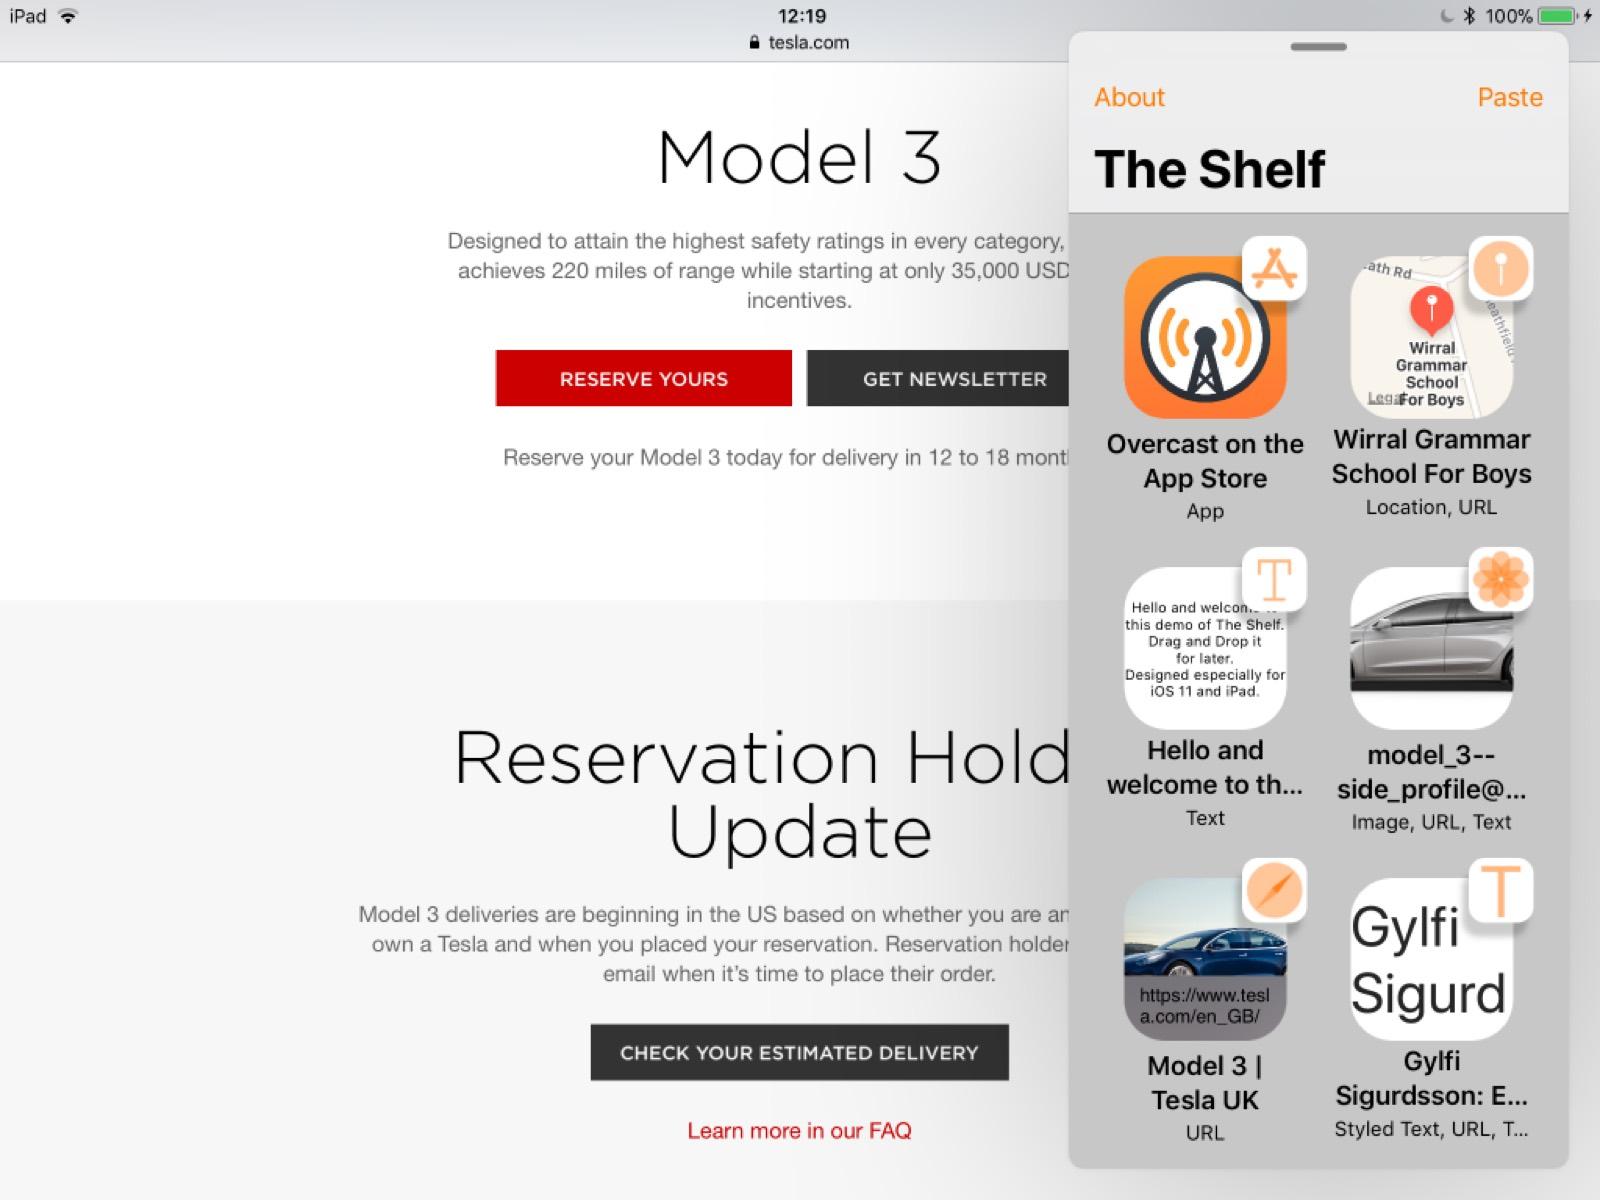 Image of the Shelf app on the iPad.